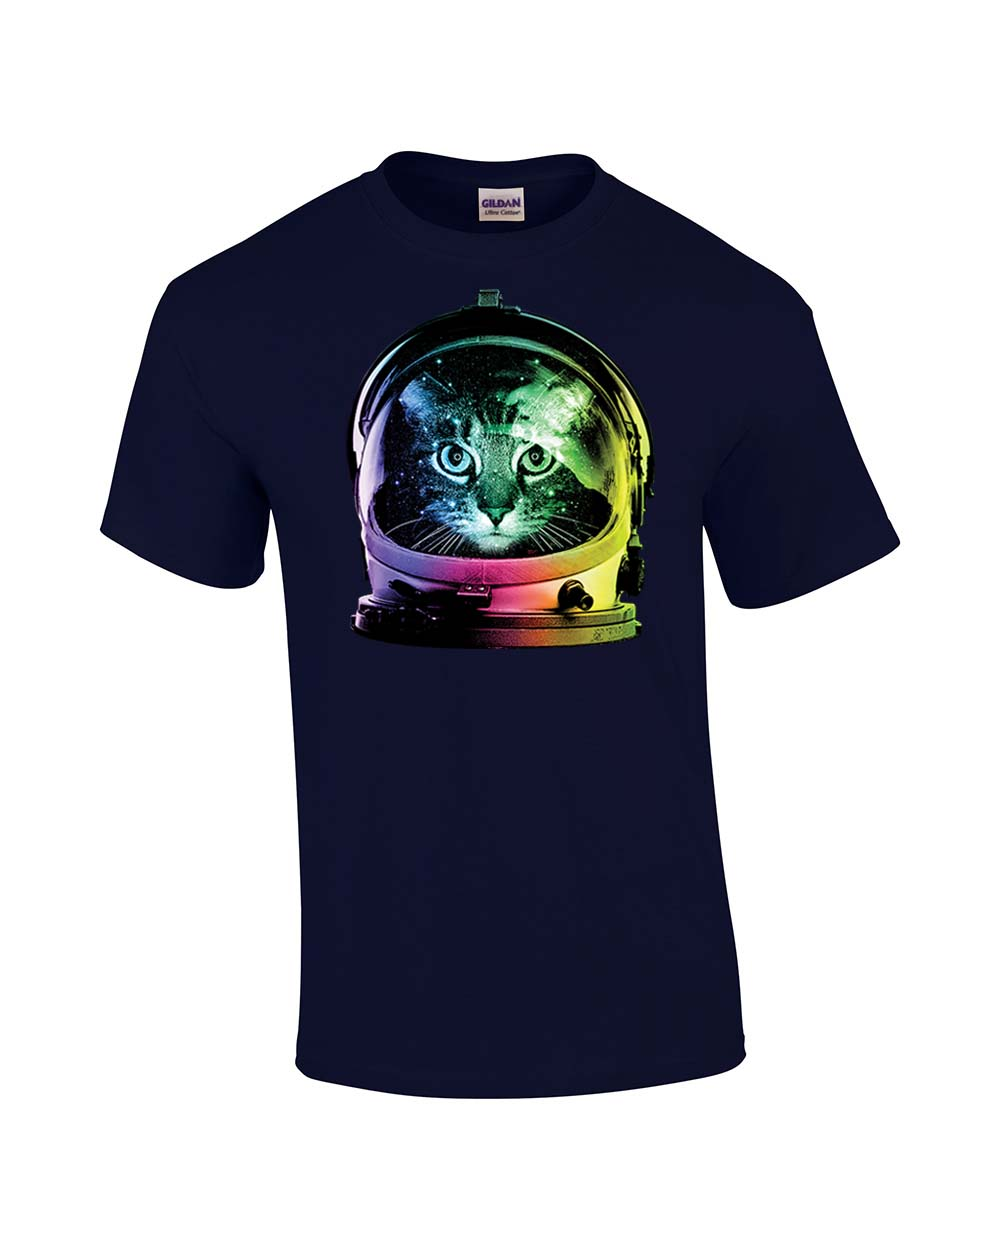 astronaut space t shirt - photo #14